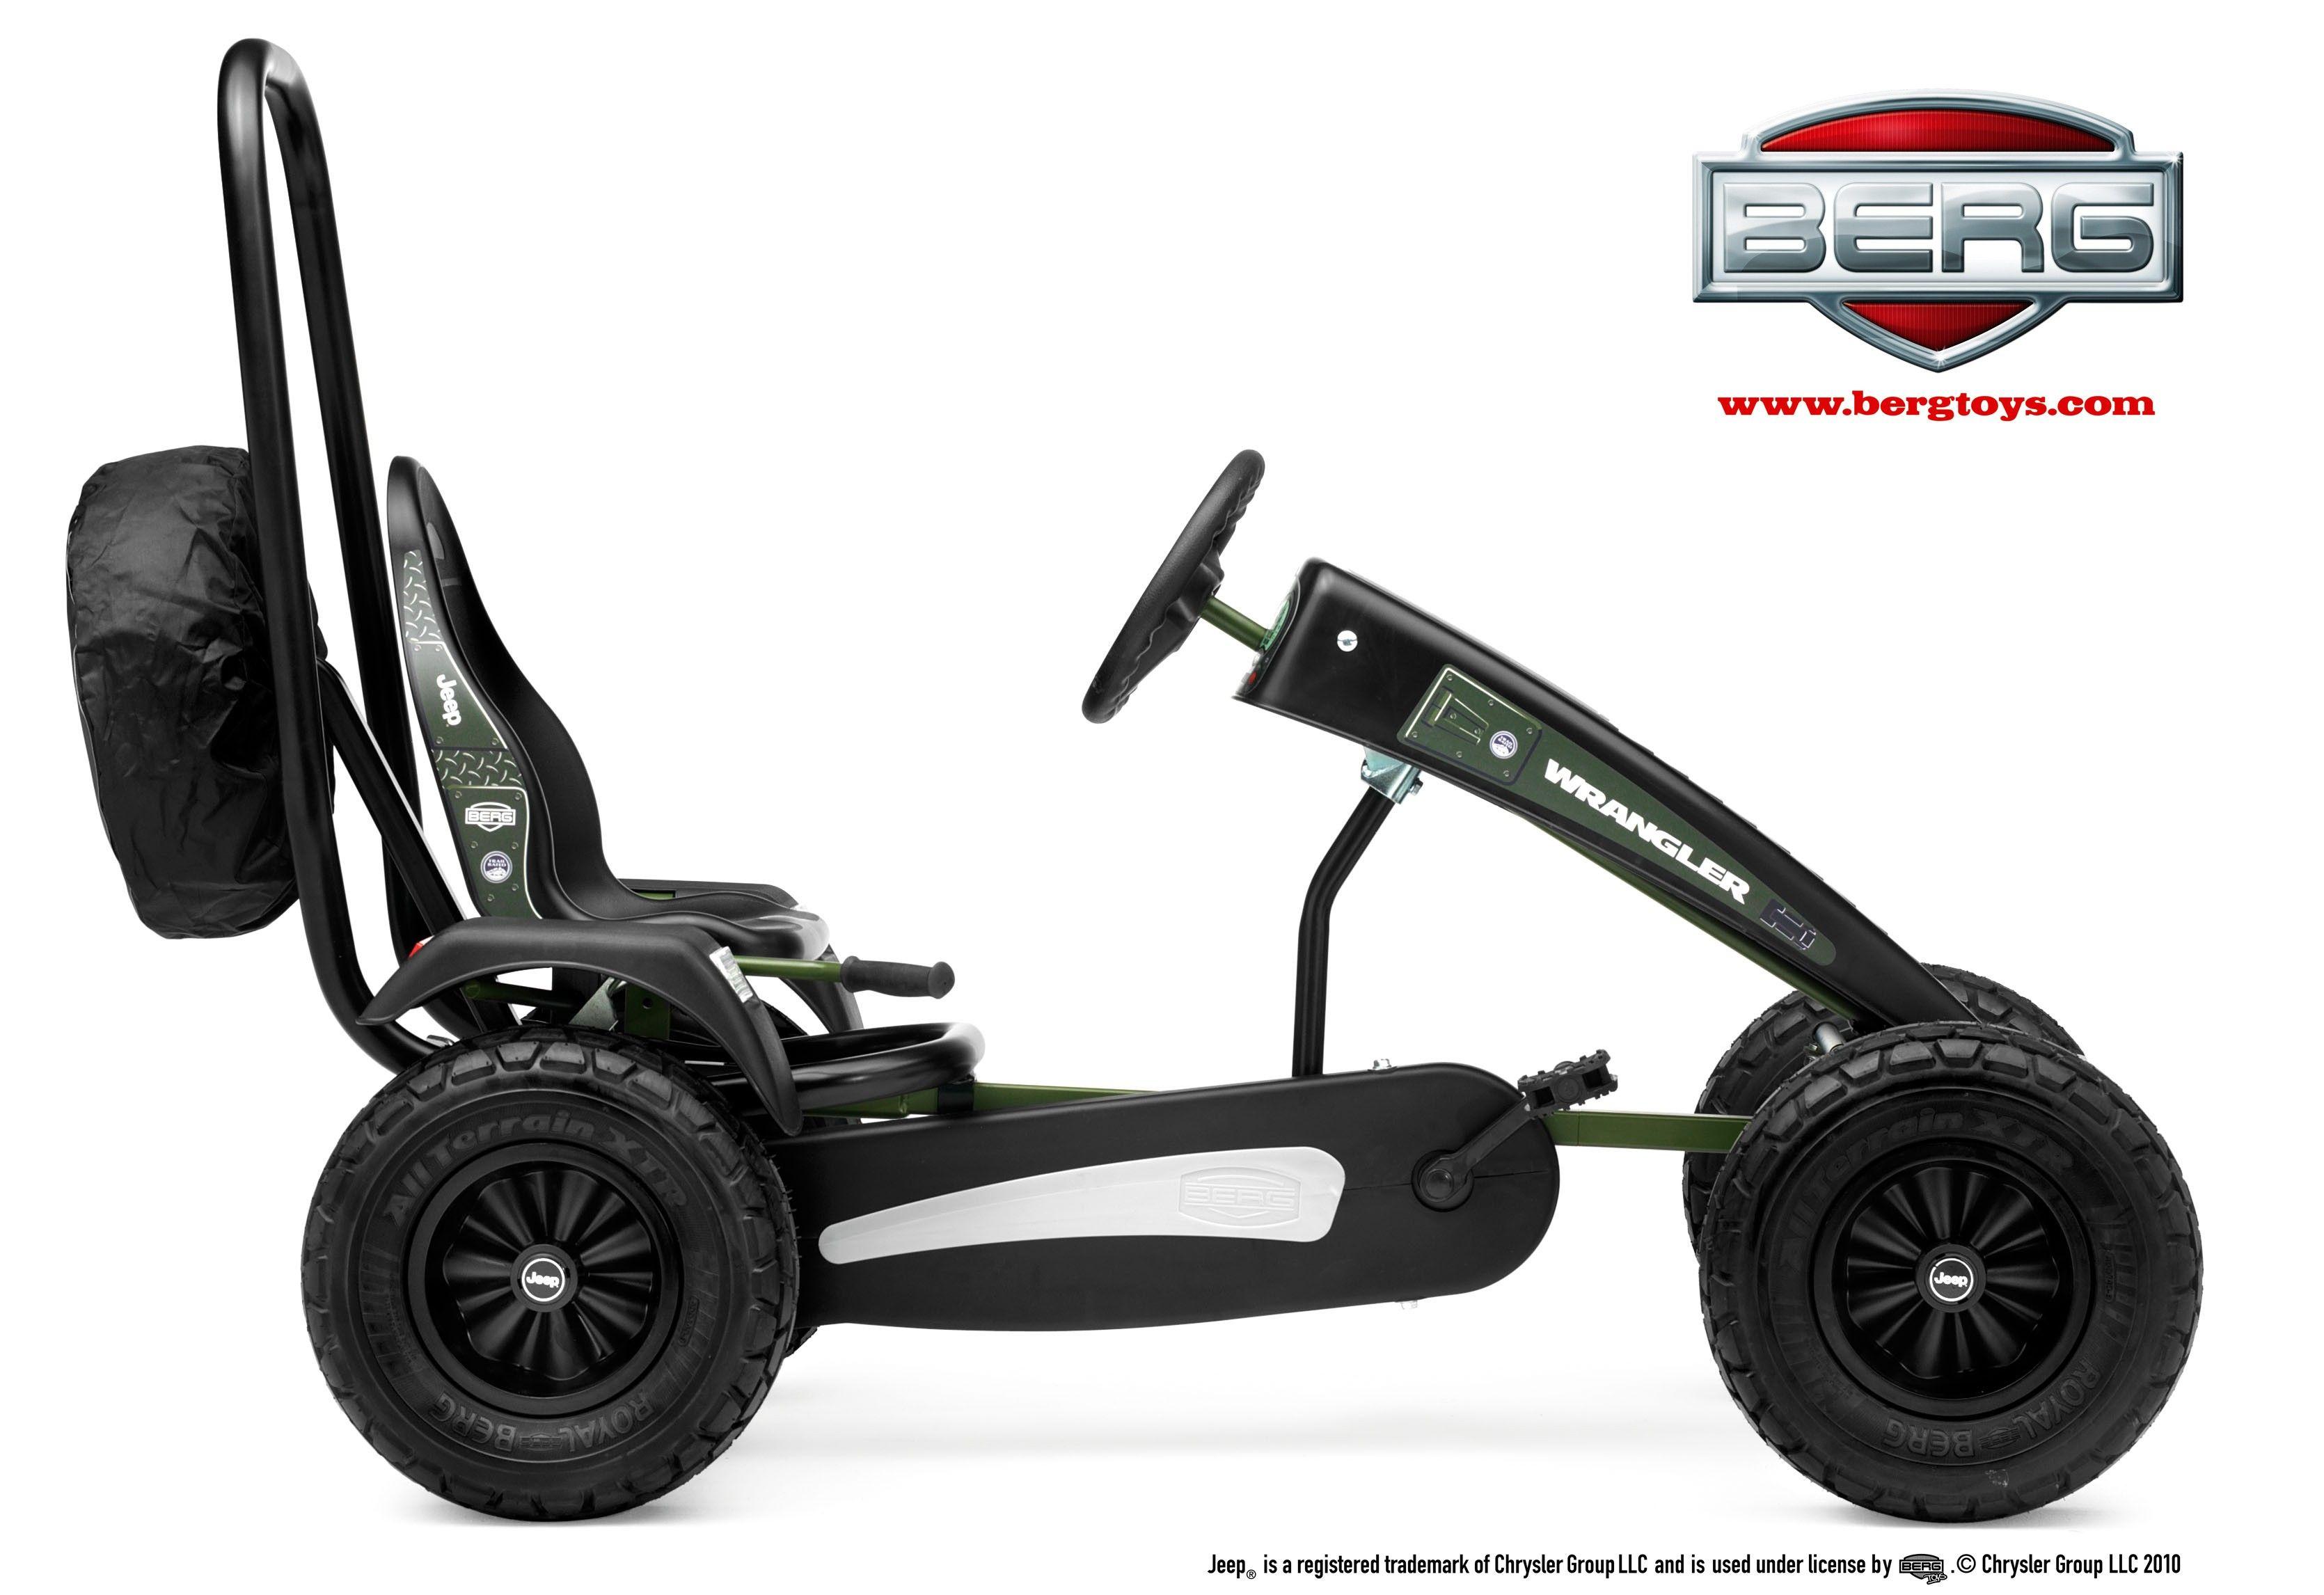 Berg Jeep Pedal Go Kart My ride Pinterest